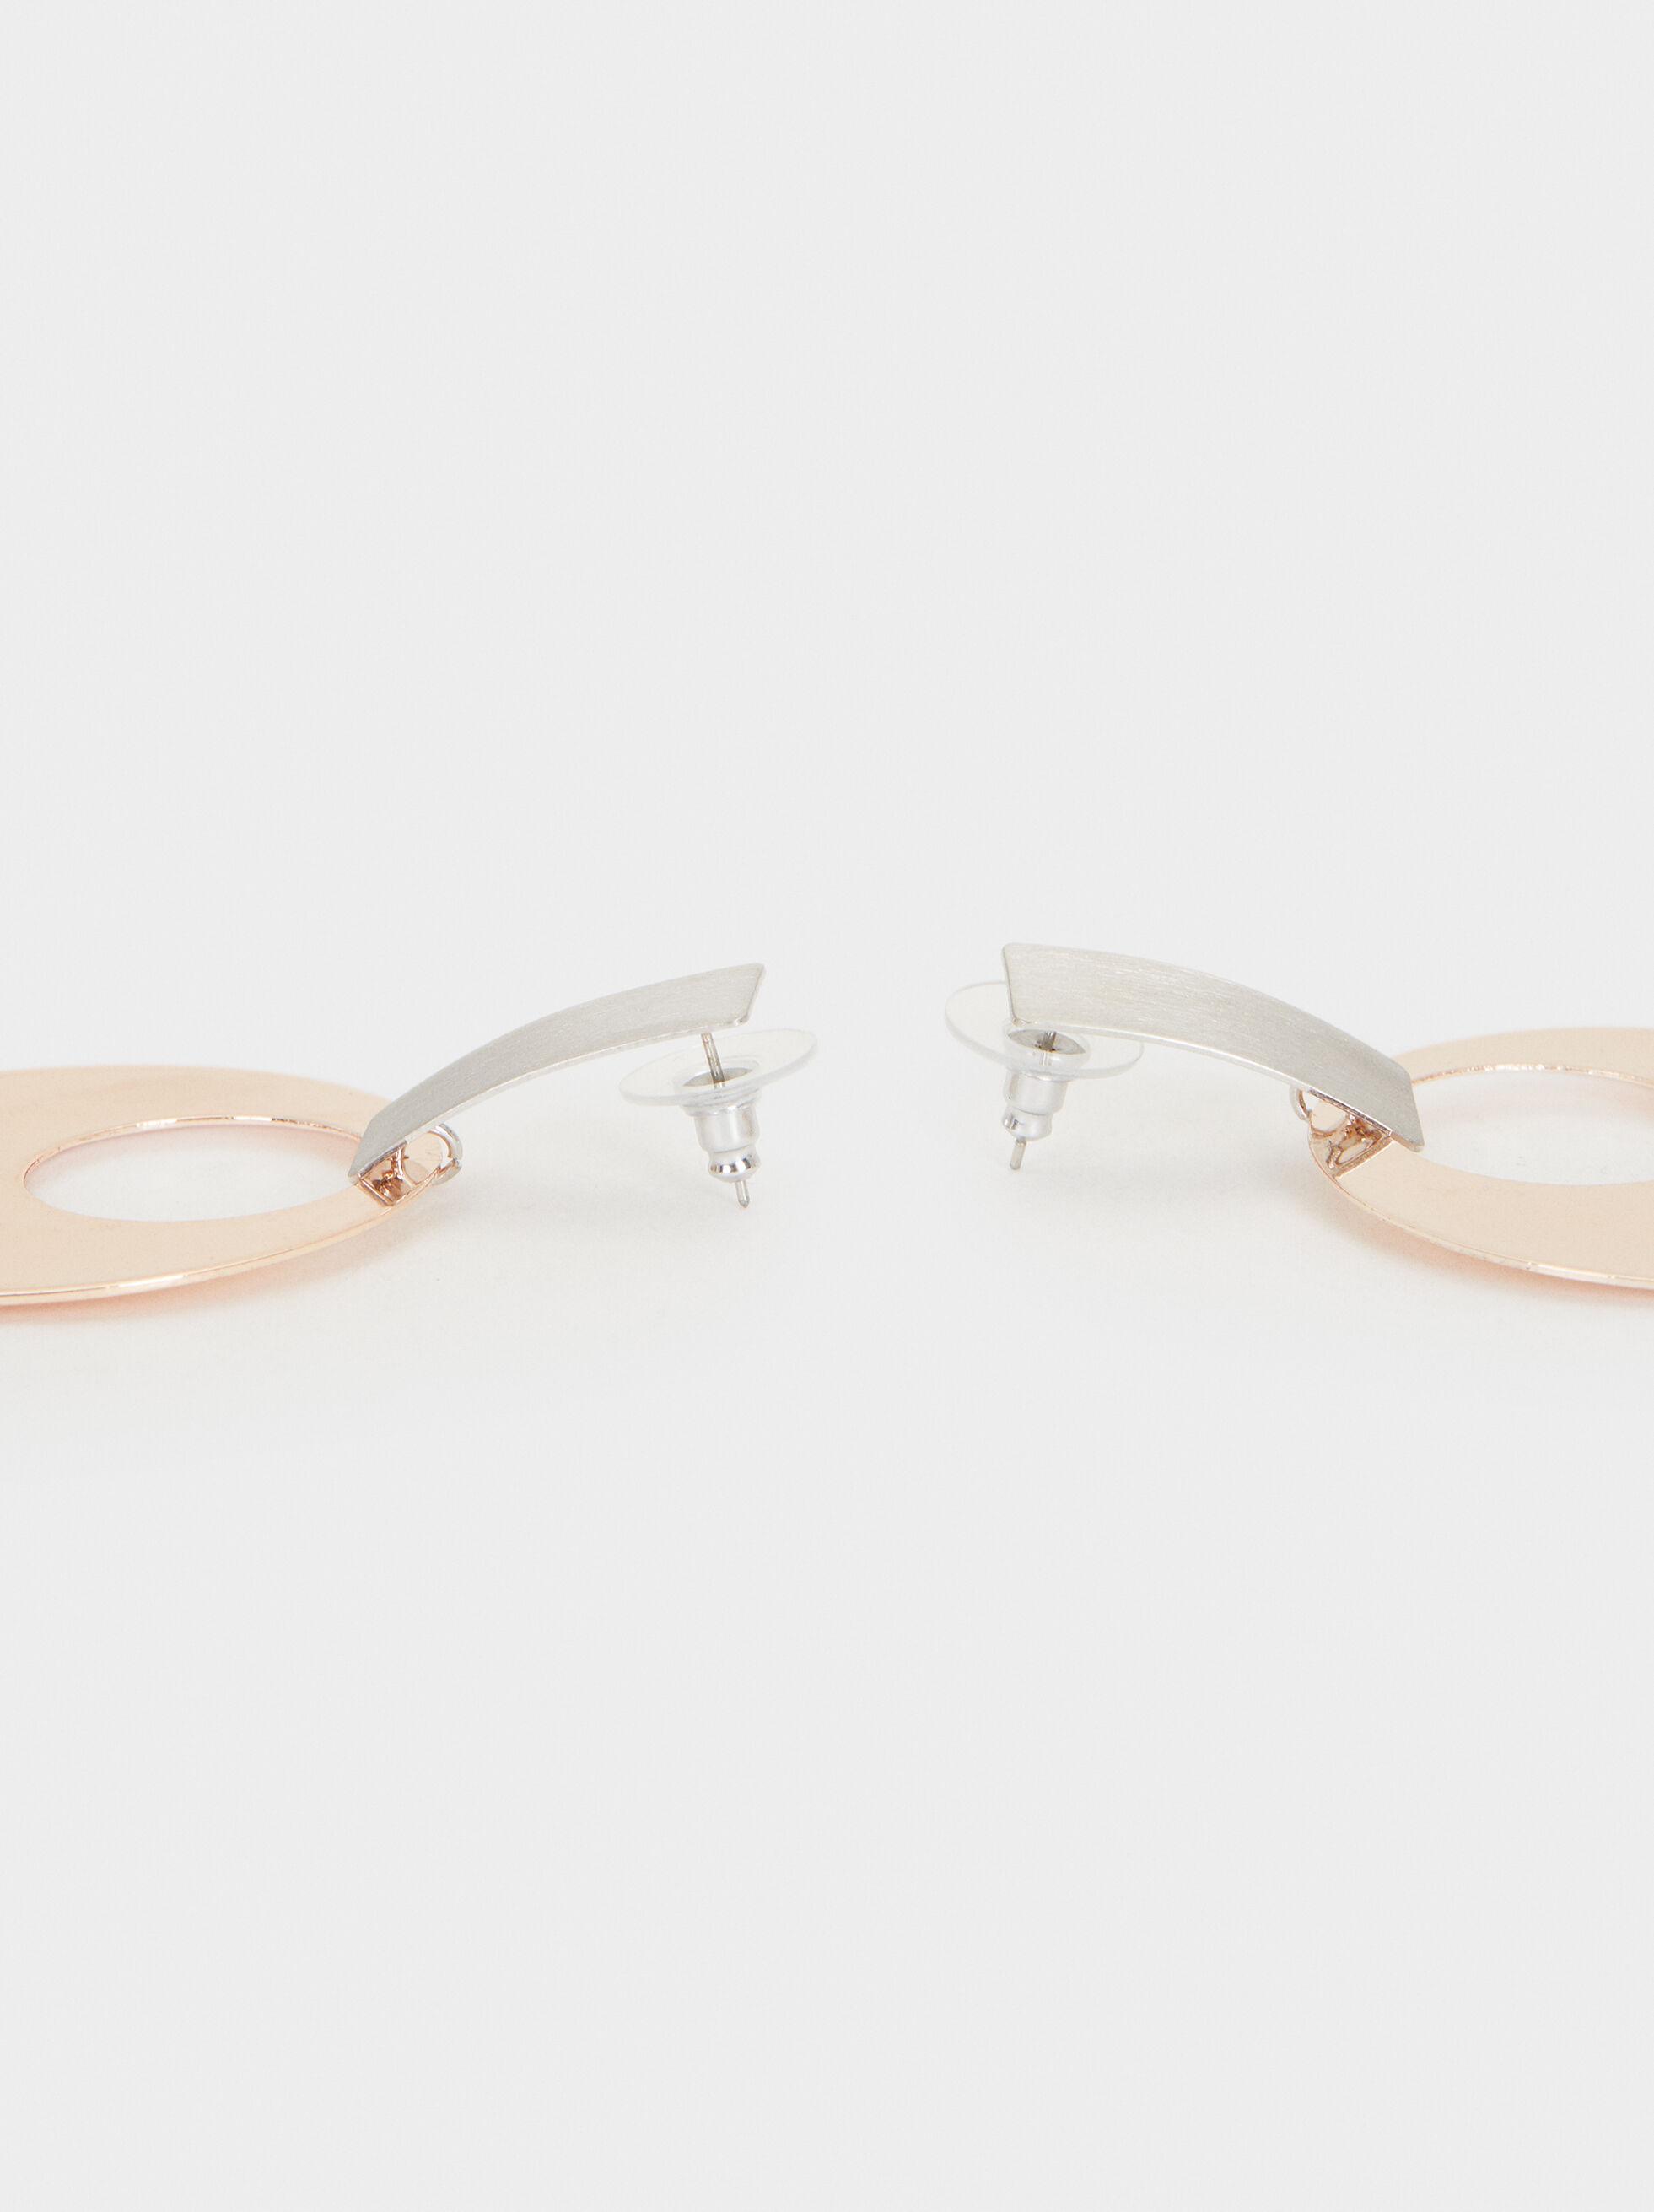 Long Two-Tone Earrings, Silver, hi-res